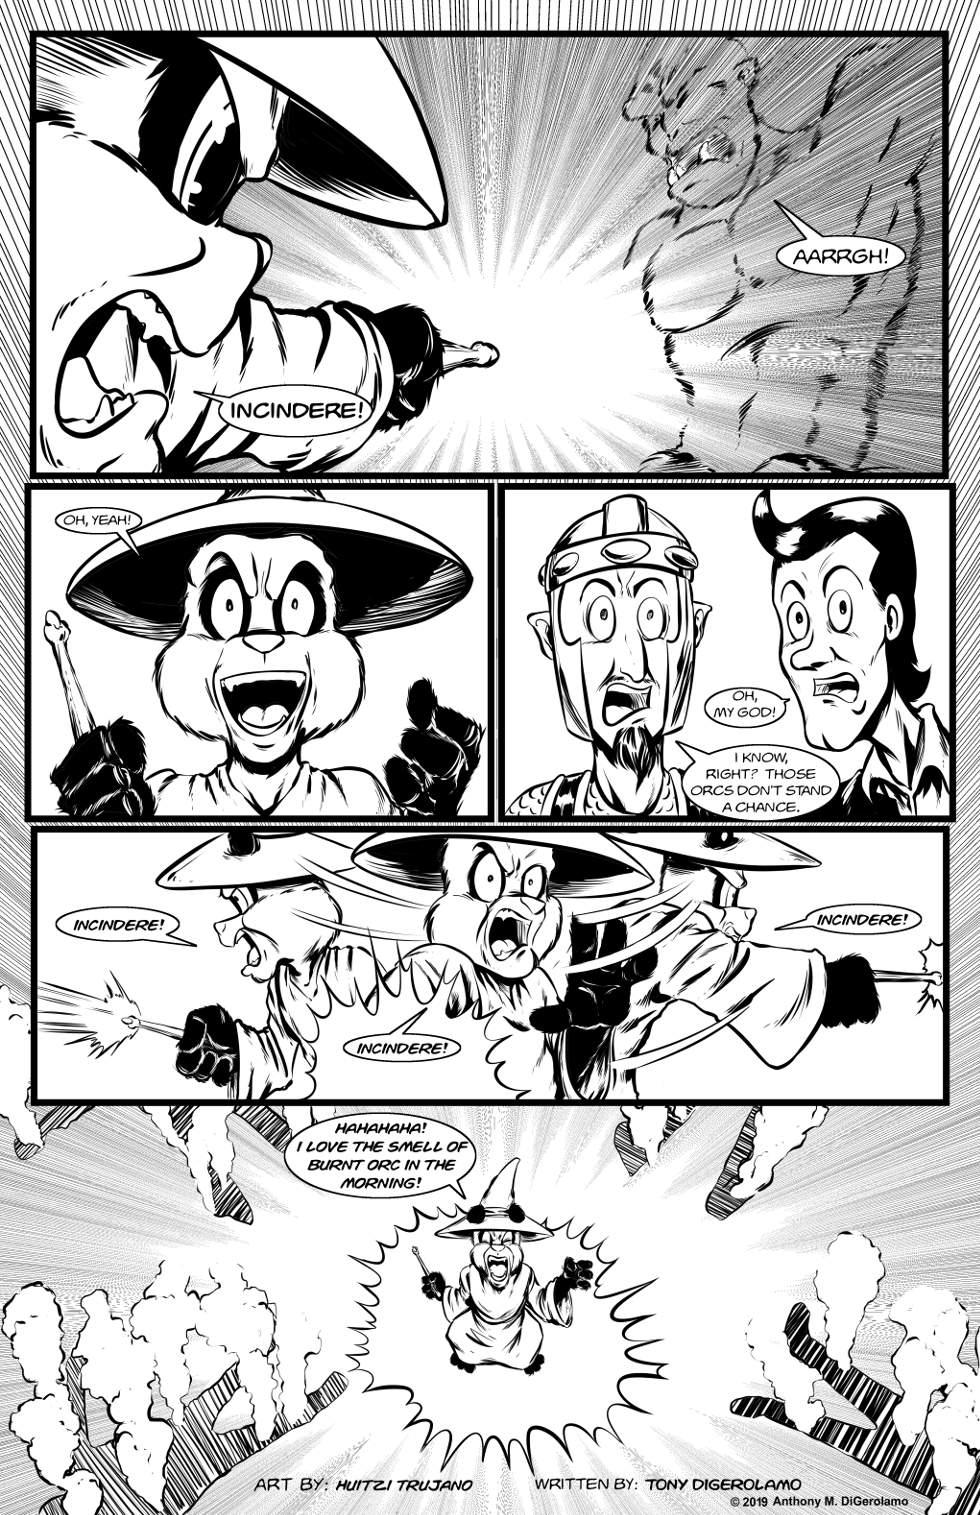 Pandamodium:  A Taste of Power